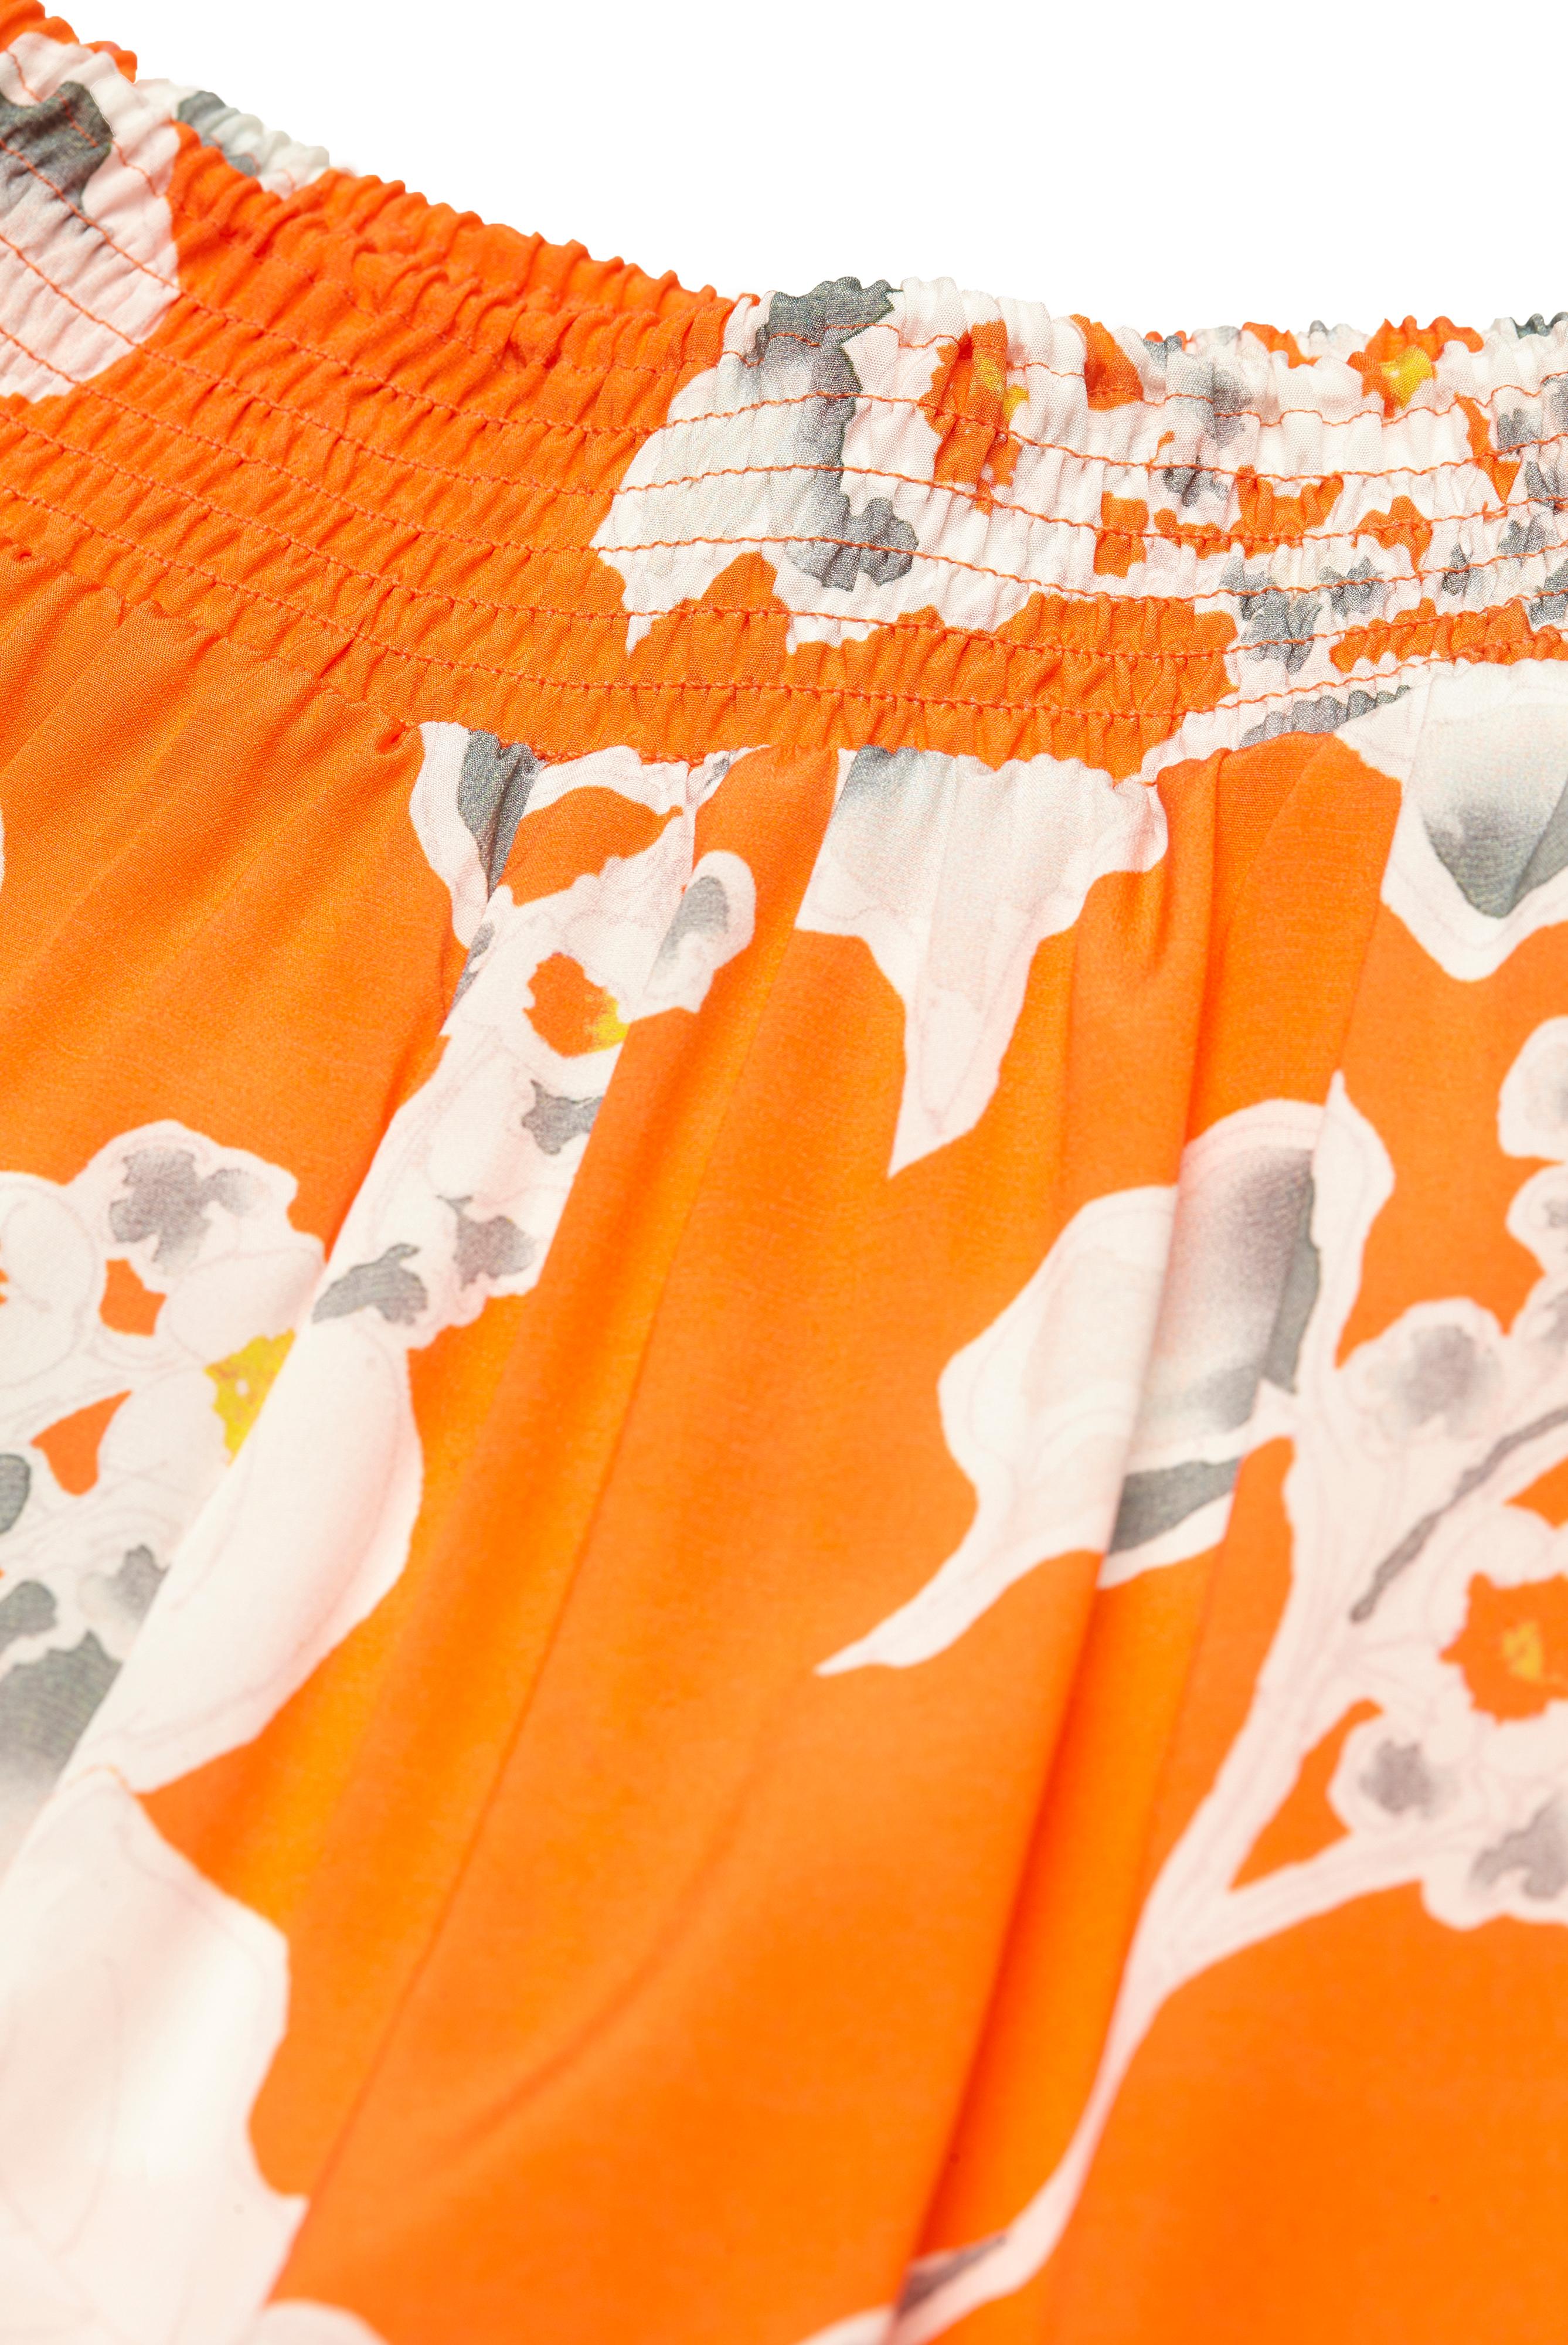 Sale+M-Halea - Palazzo trousers in apple blossom print+05.652S..171699.350.34